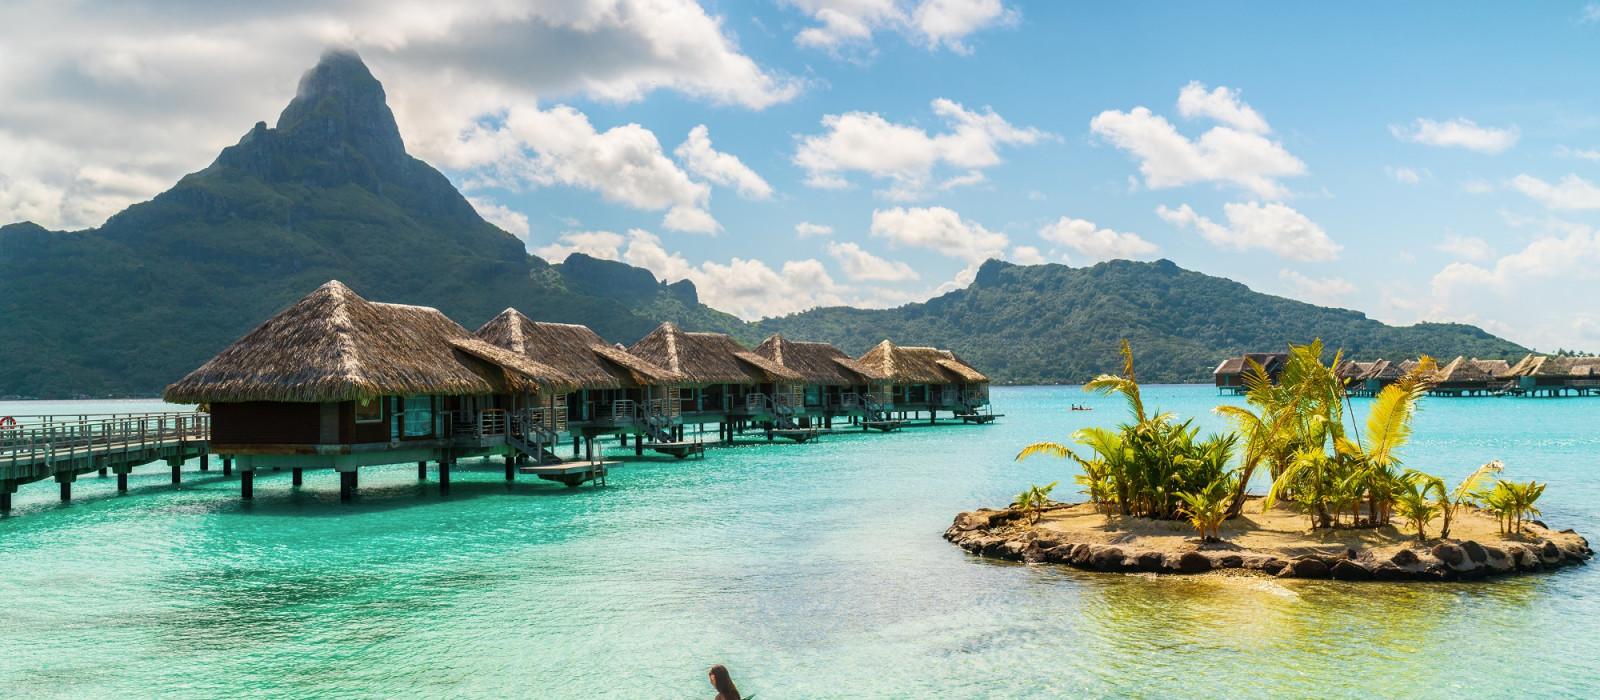 Secrets of the South Pacific: Tahiti, Bora Bora and Blue Lagoon Tour Trip 1